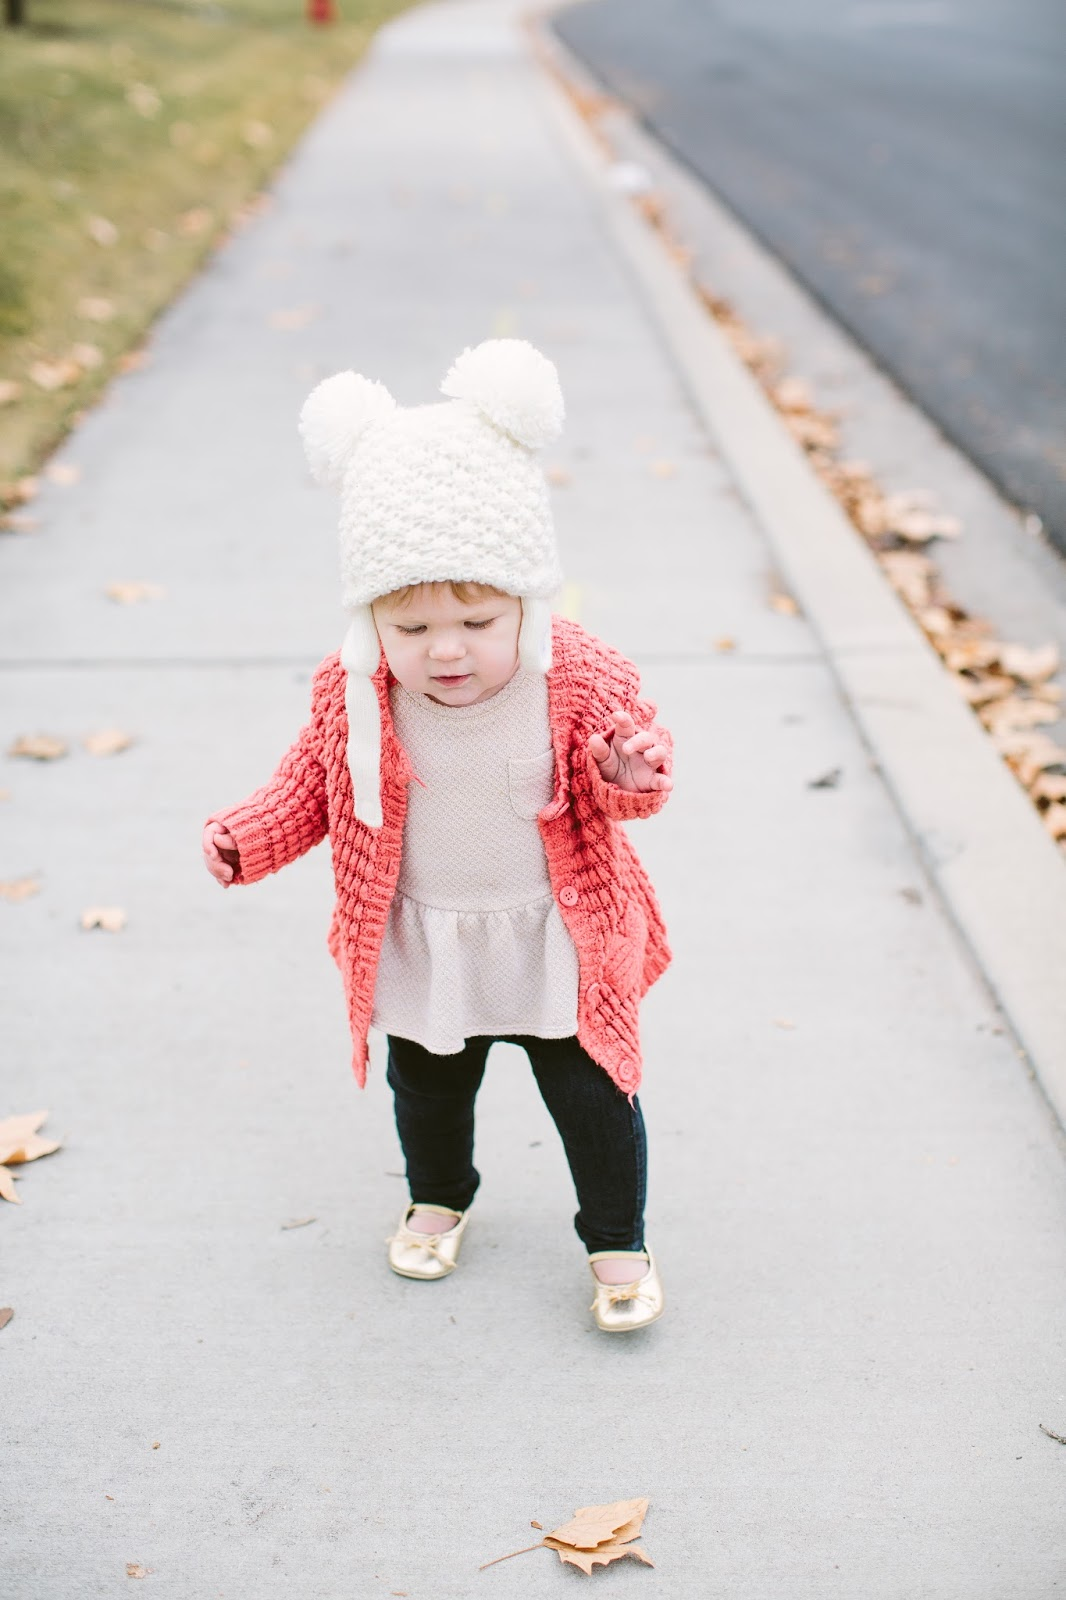 Cute Baby, Baby Fashion, Cute Baby Fashion